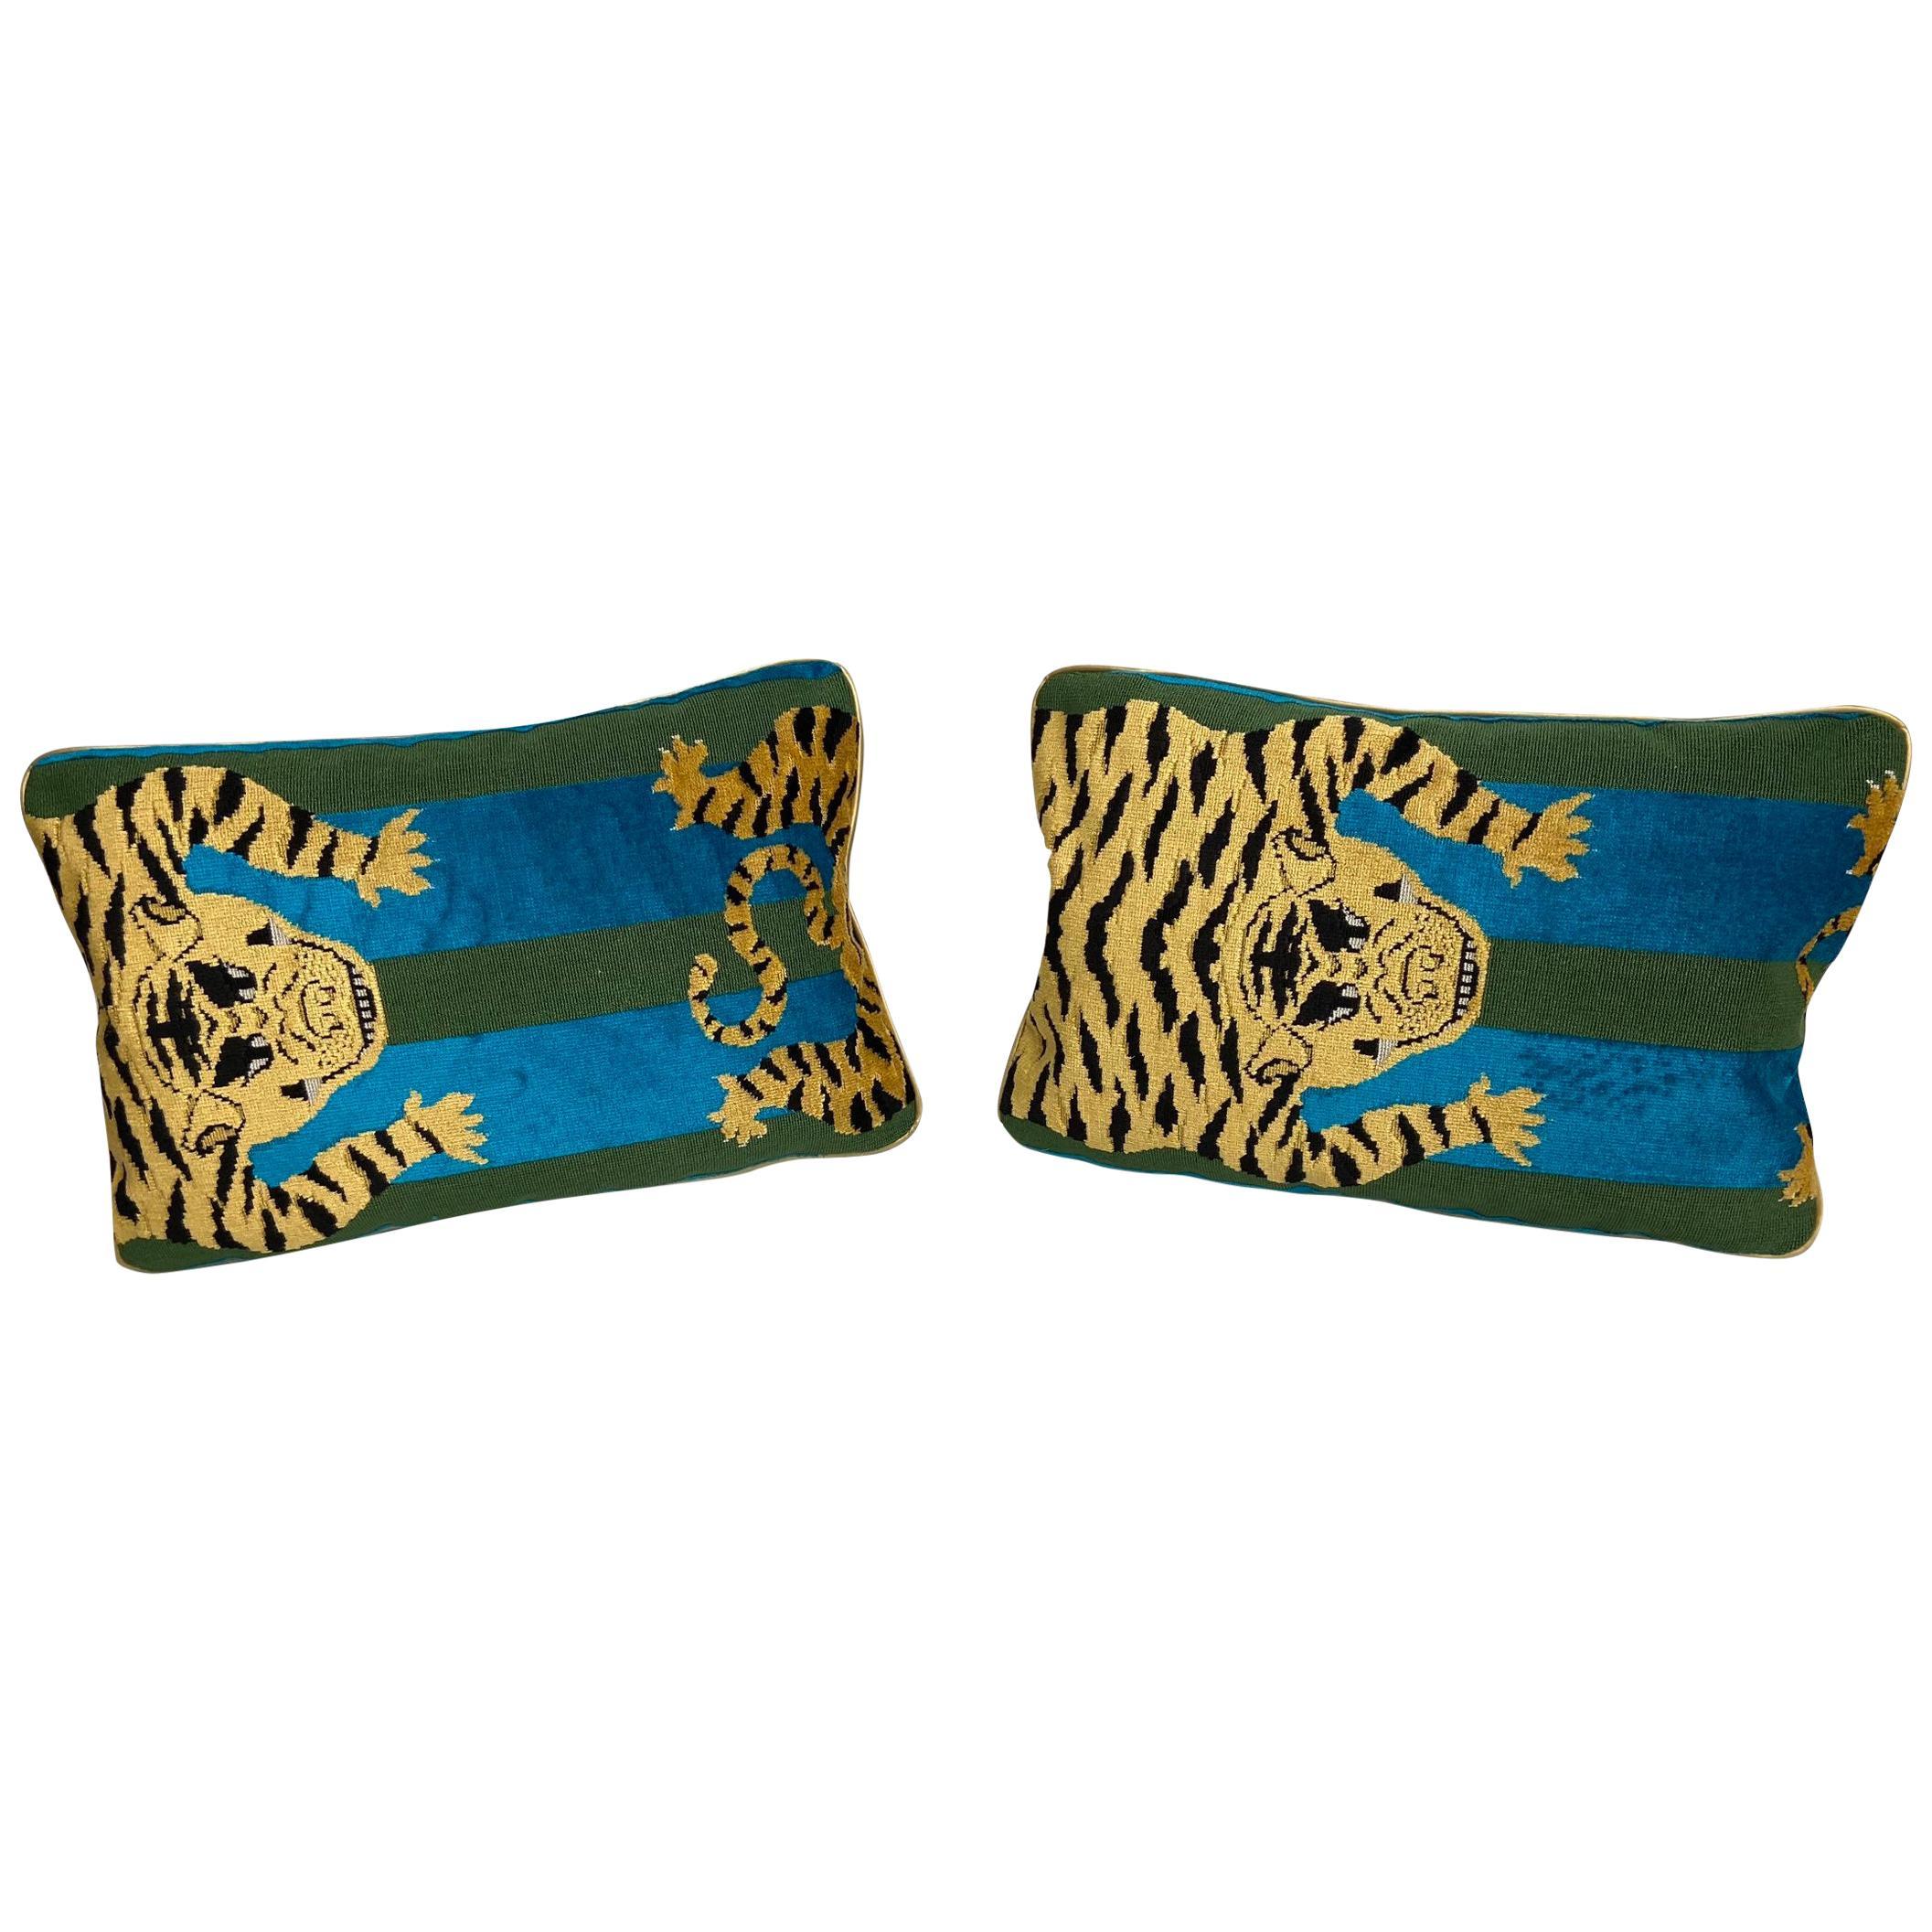 Jokhang Tiger Velvet Peacock & Olive Lumbar Pillows